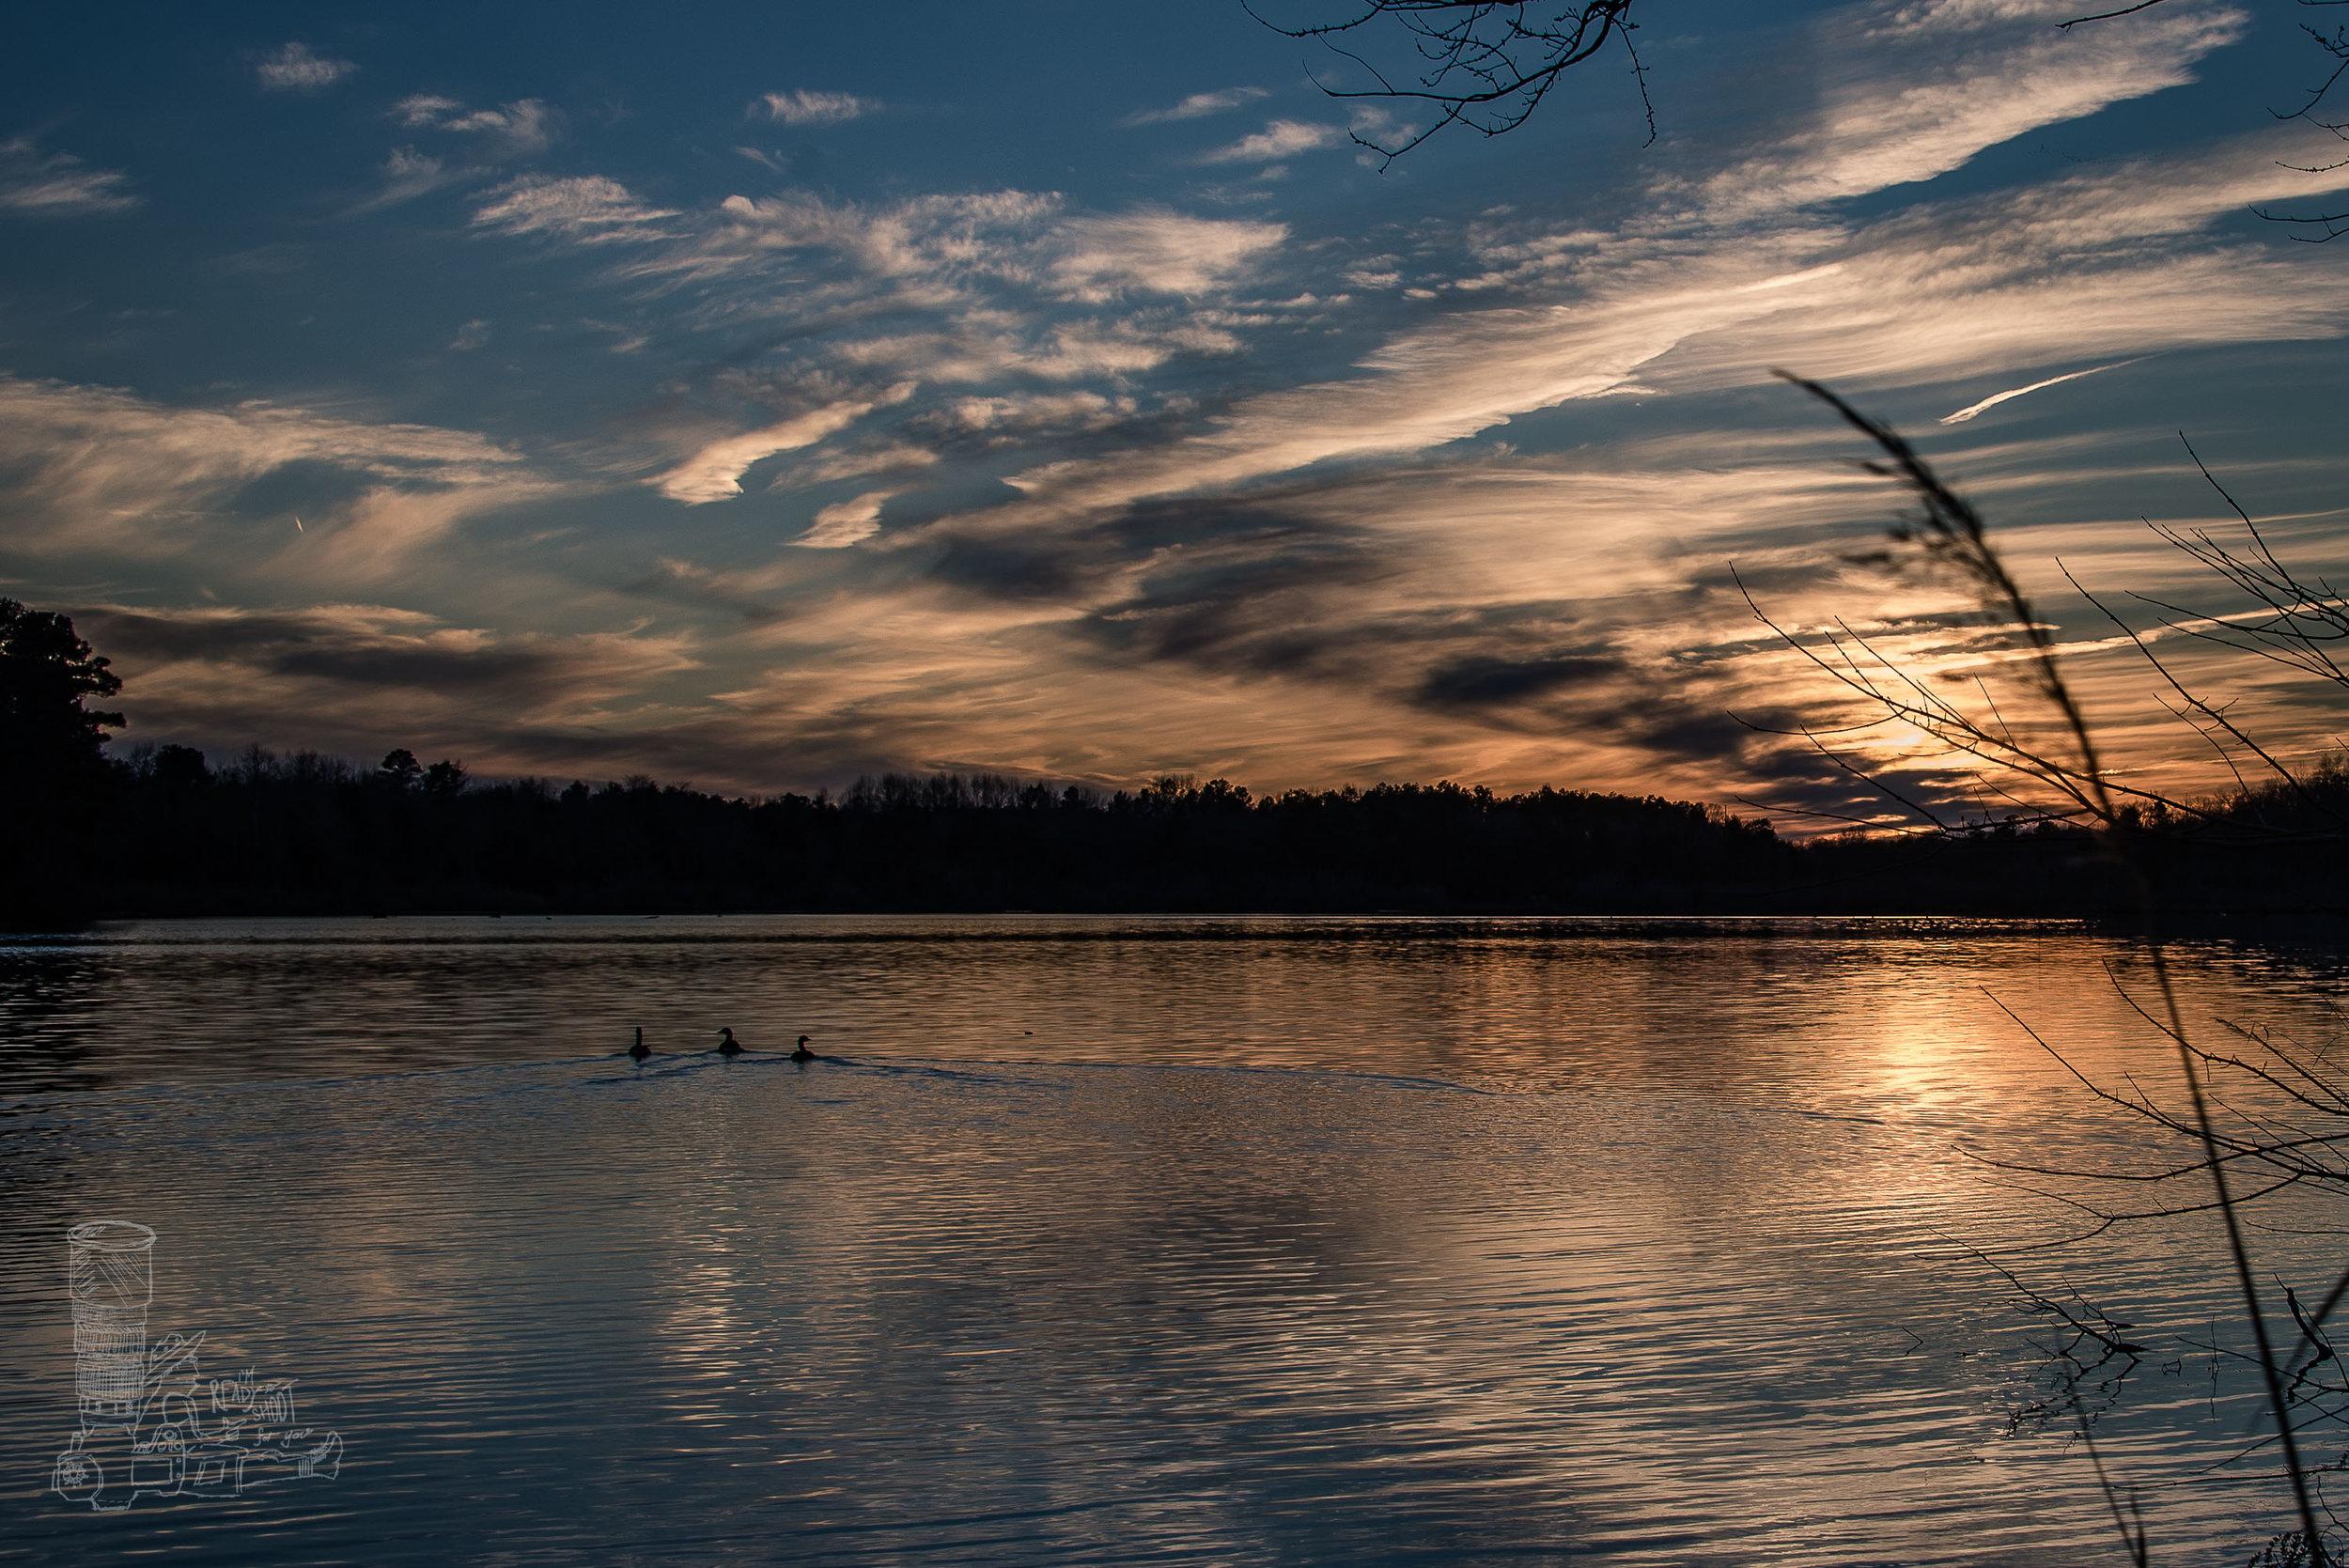 Waples at Sunset